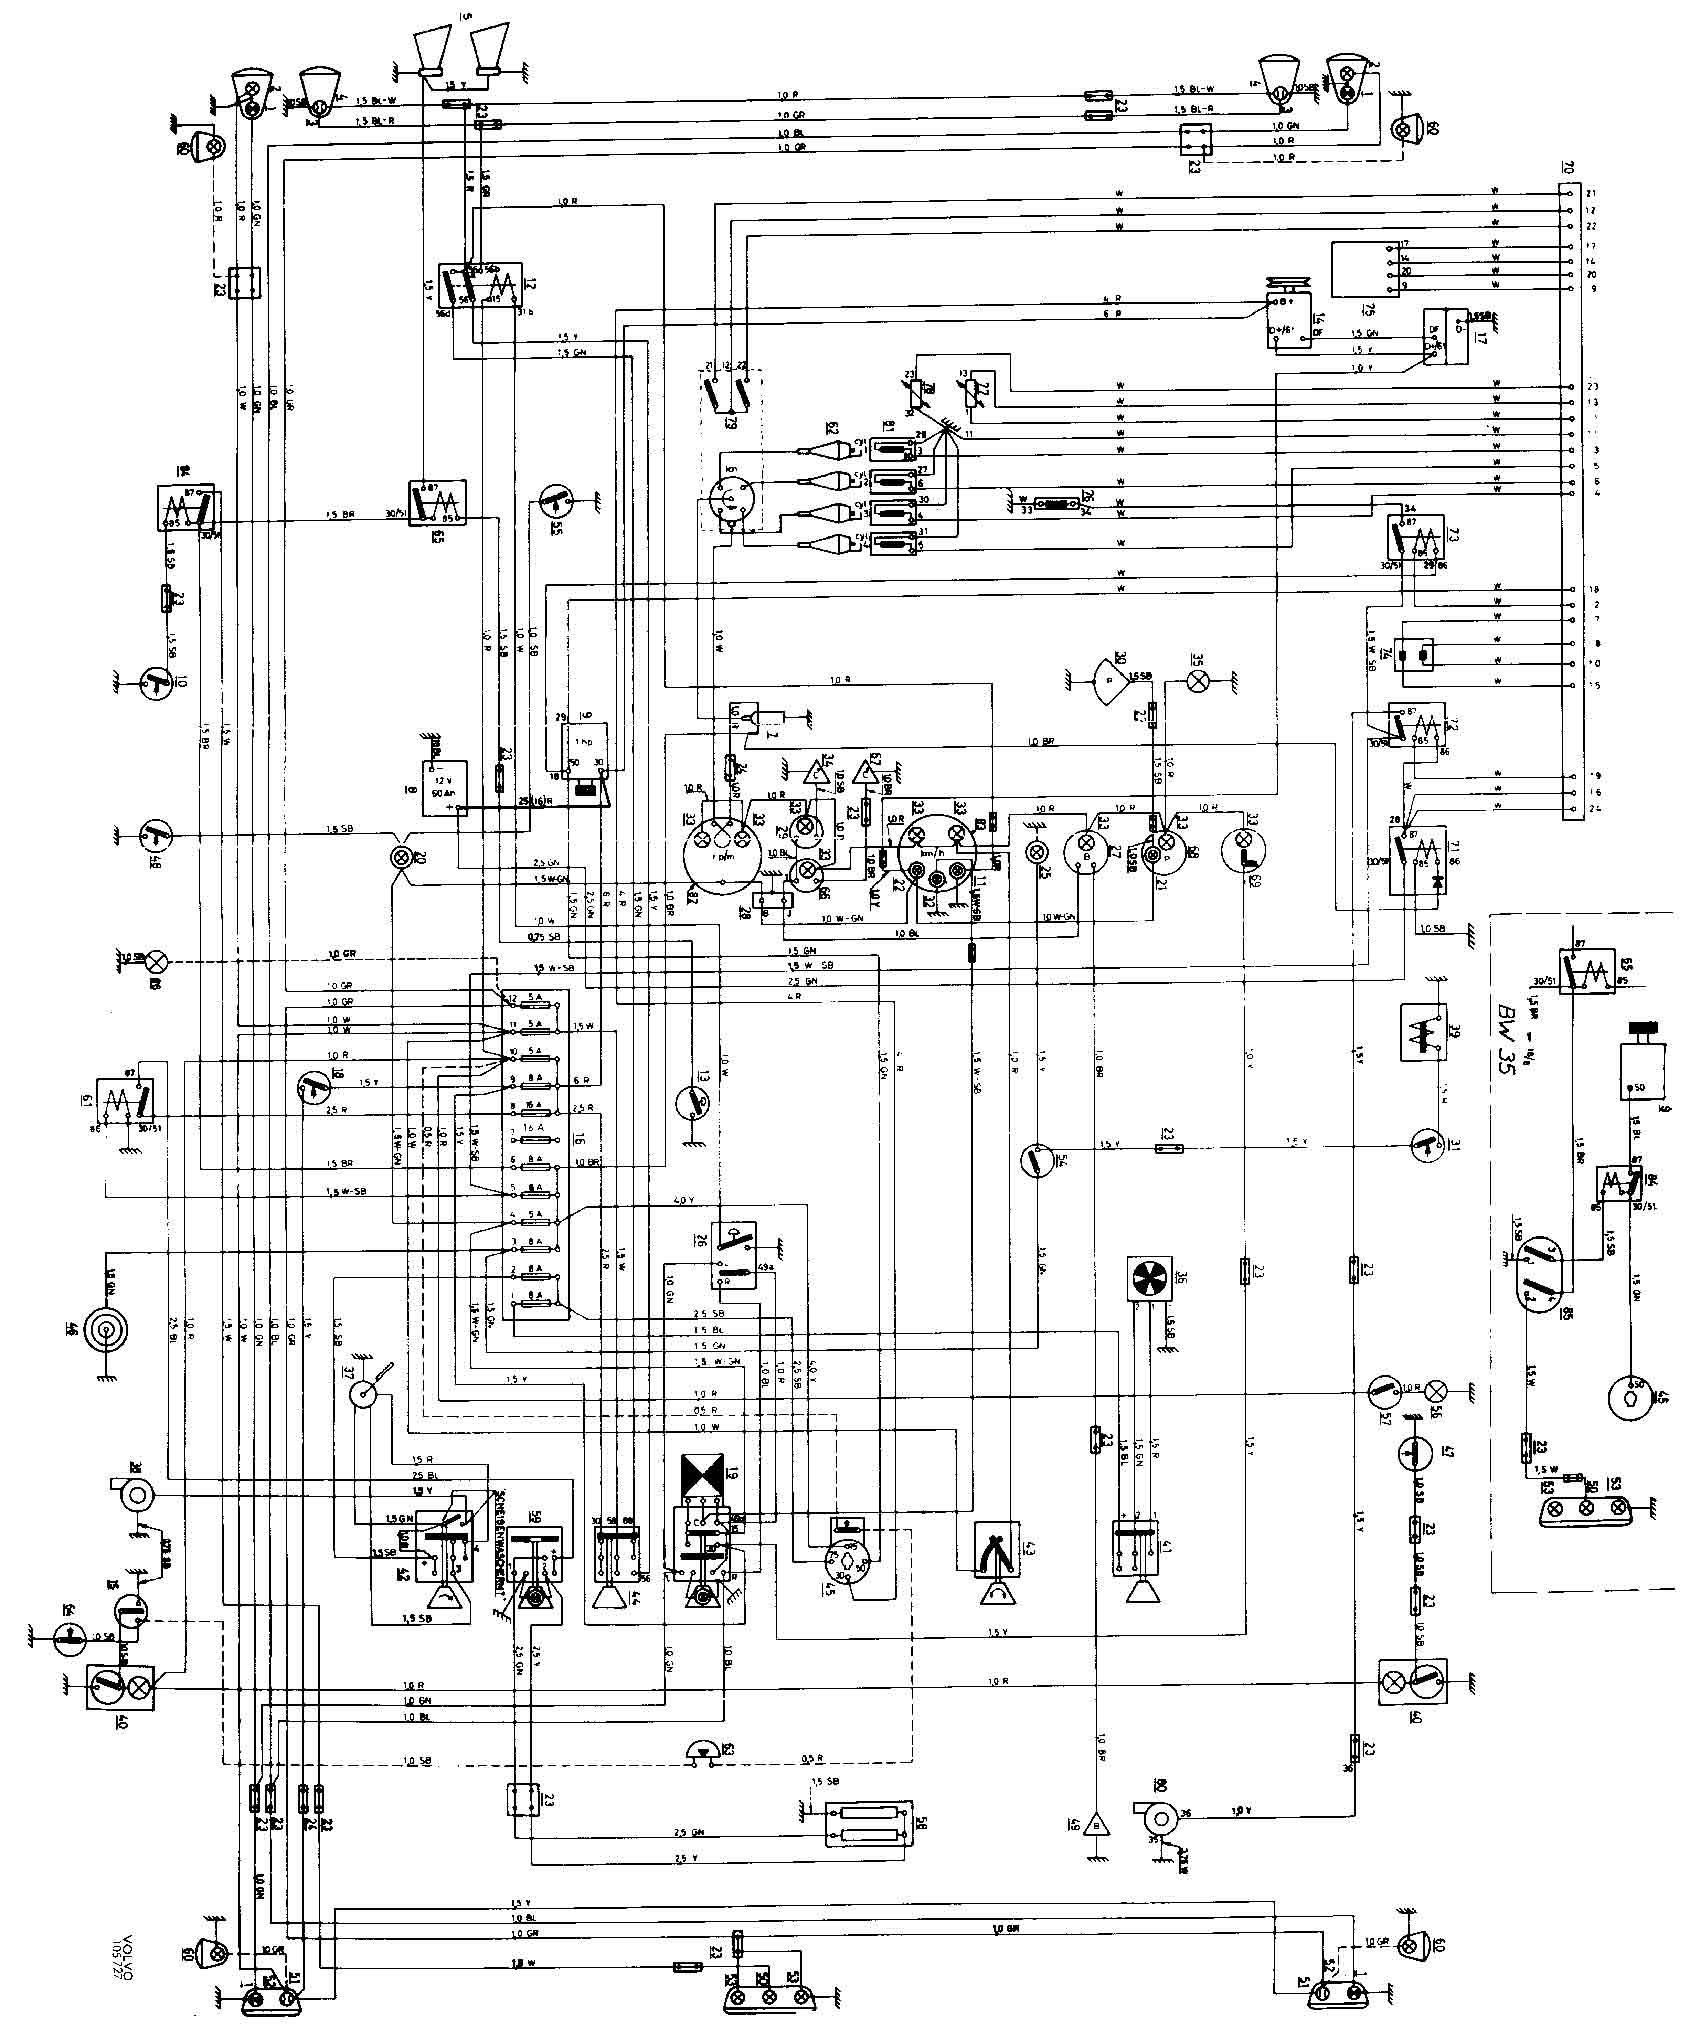 tomberlin crossfire 150r wiring diagram